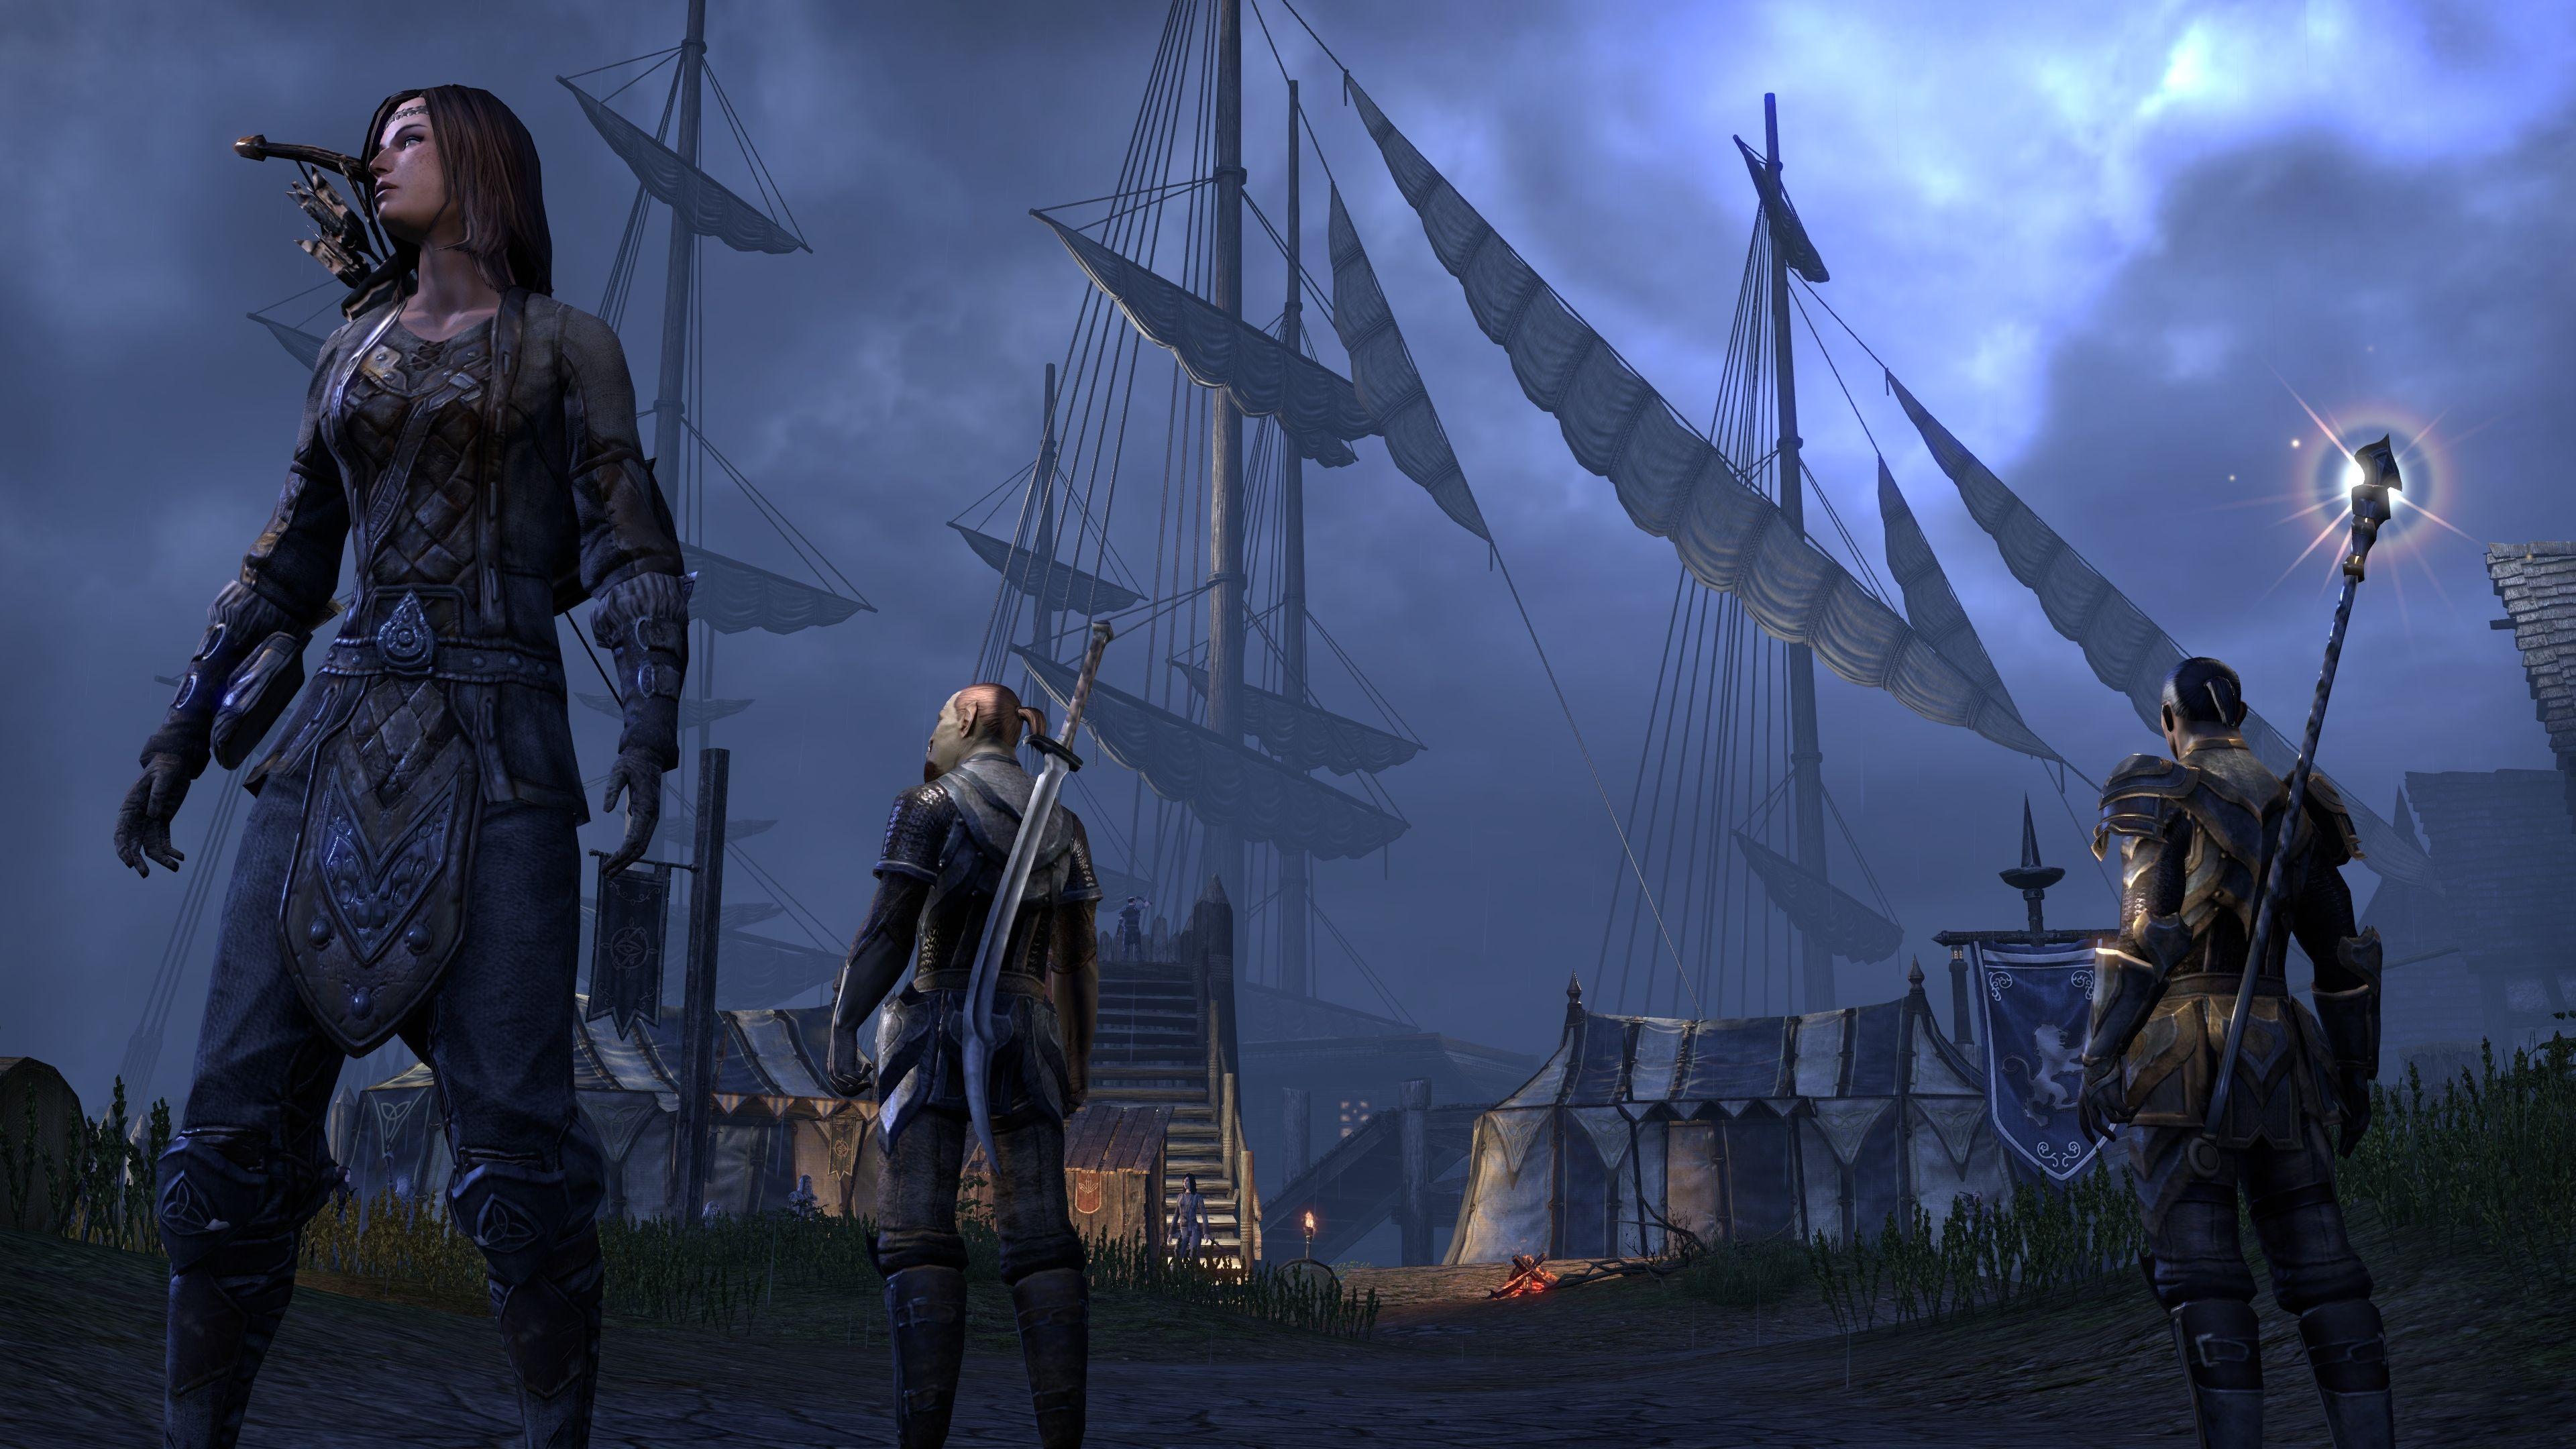 E3 Hands On With Elder Scrolls Online Elder Scrolls Online Elder Scrolls Hero S Journey The elder scrolls online markarth dlc